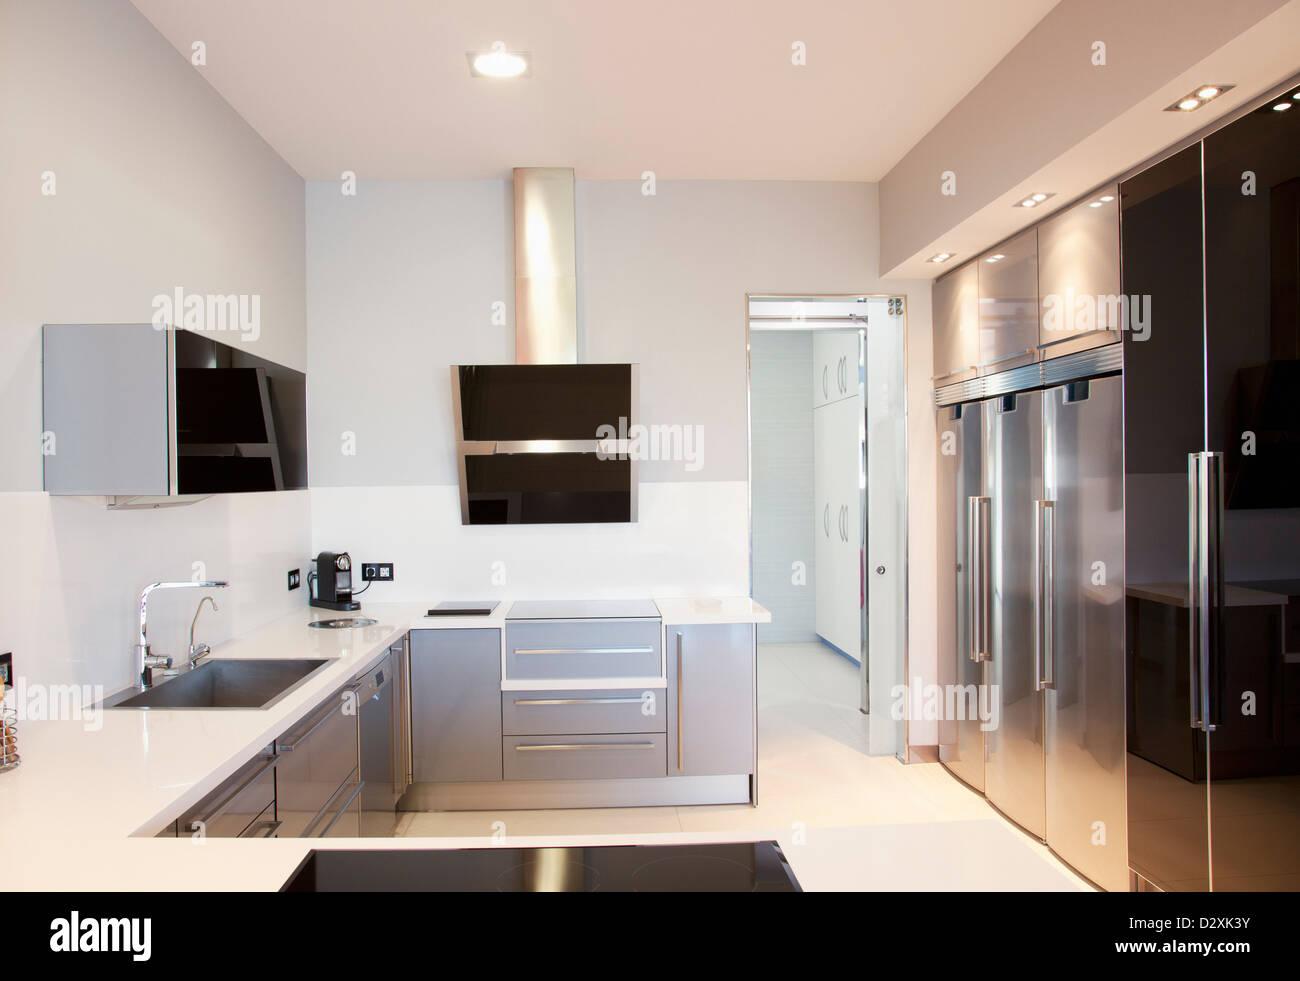 Moderne Luxus Kuche Stockfoto Bild 53446175 Alamy